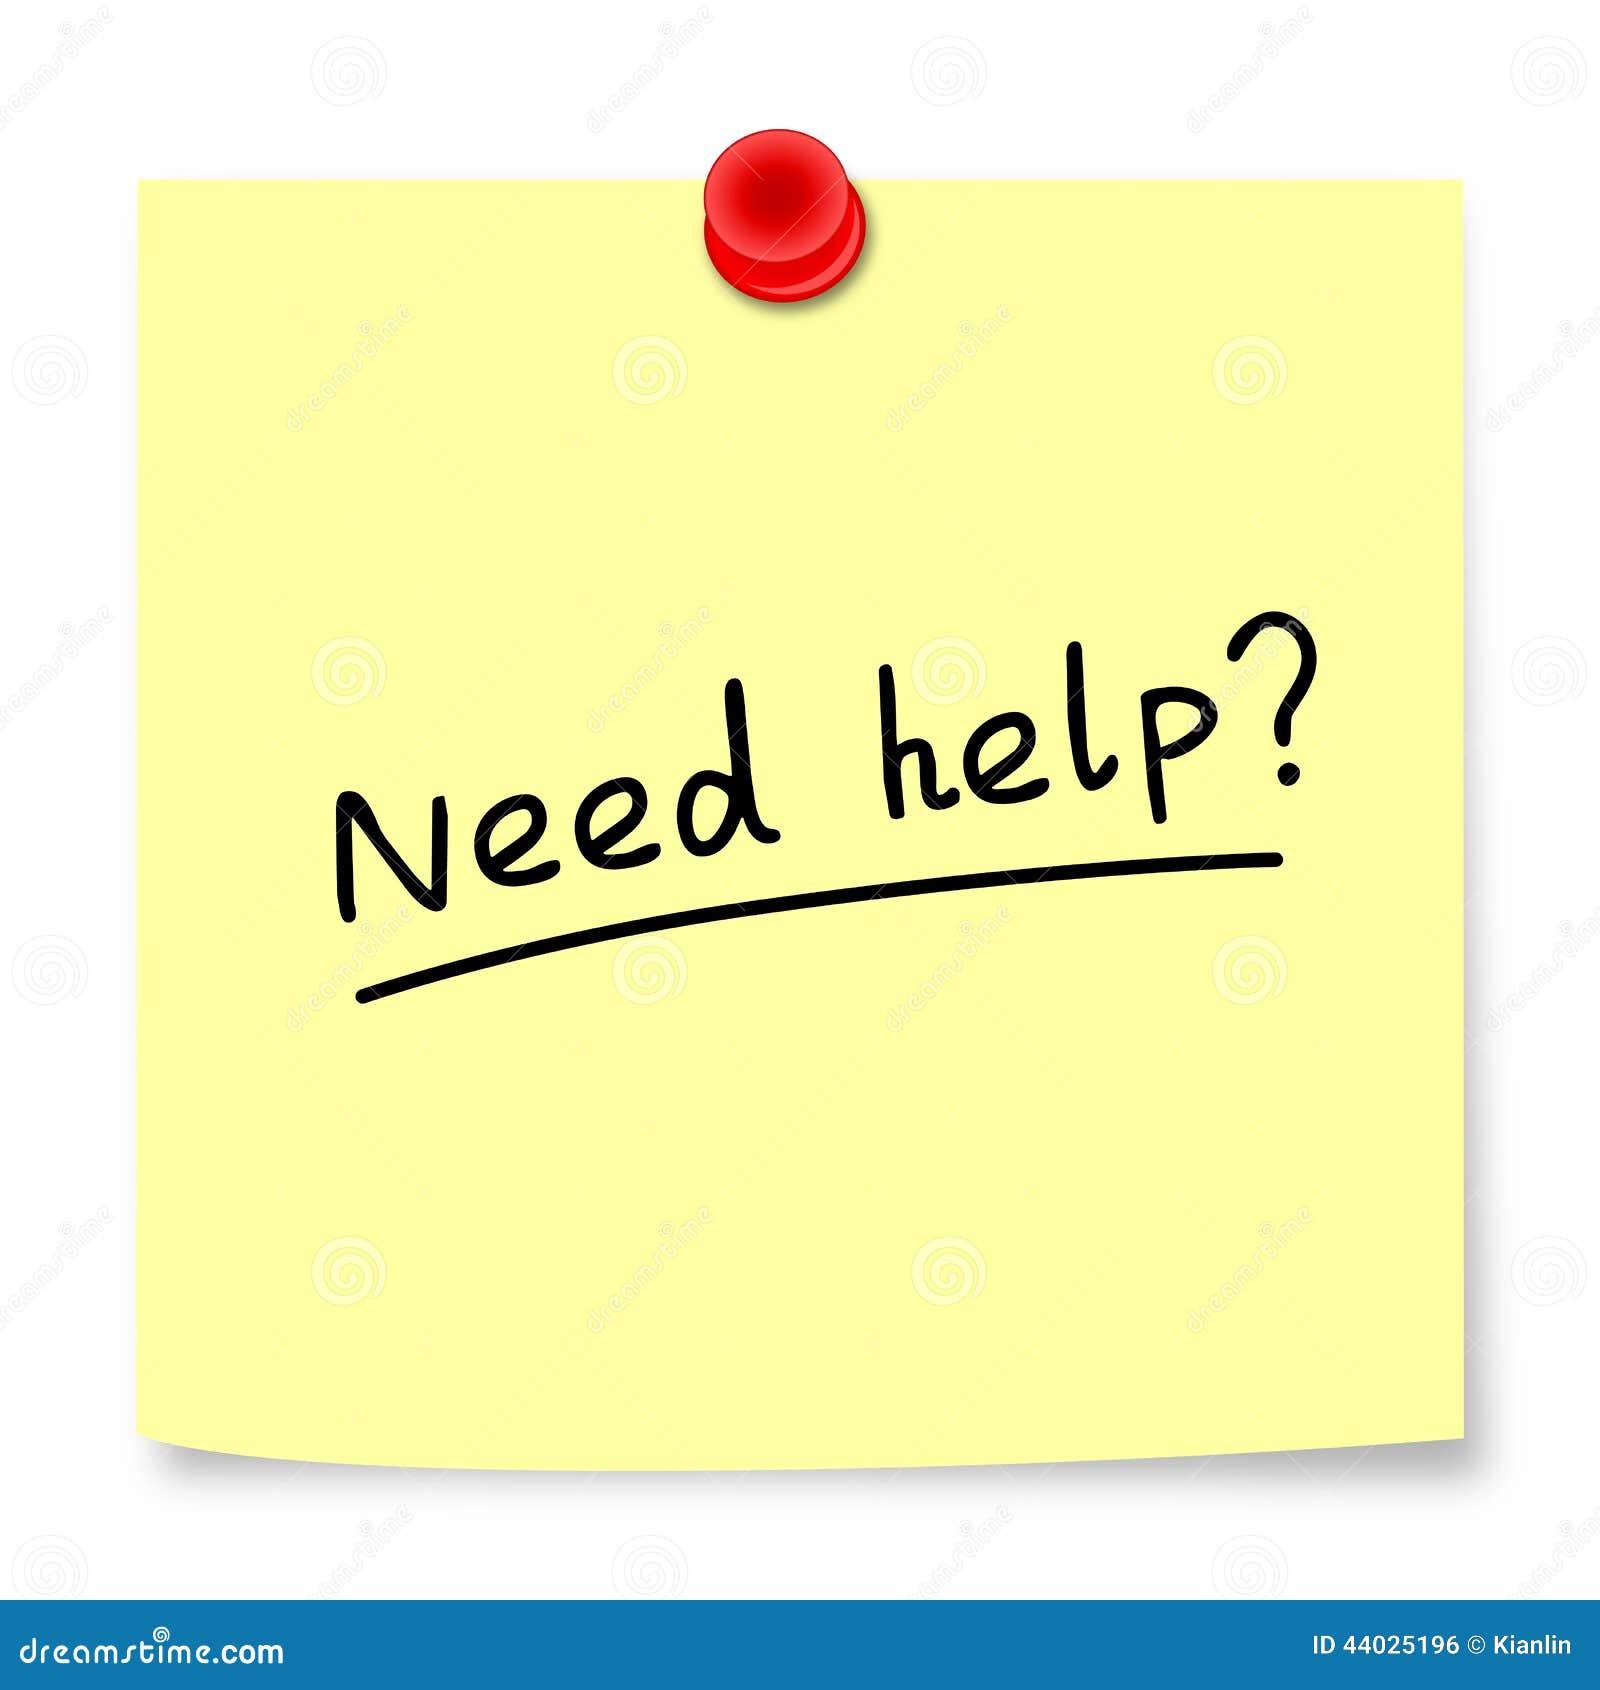 Need Help Royalty-Free Stock Photo | CartoonDealer.com ...